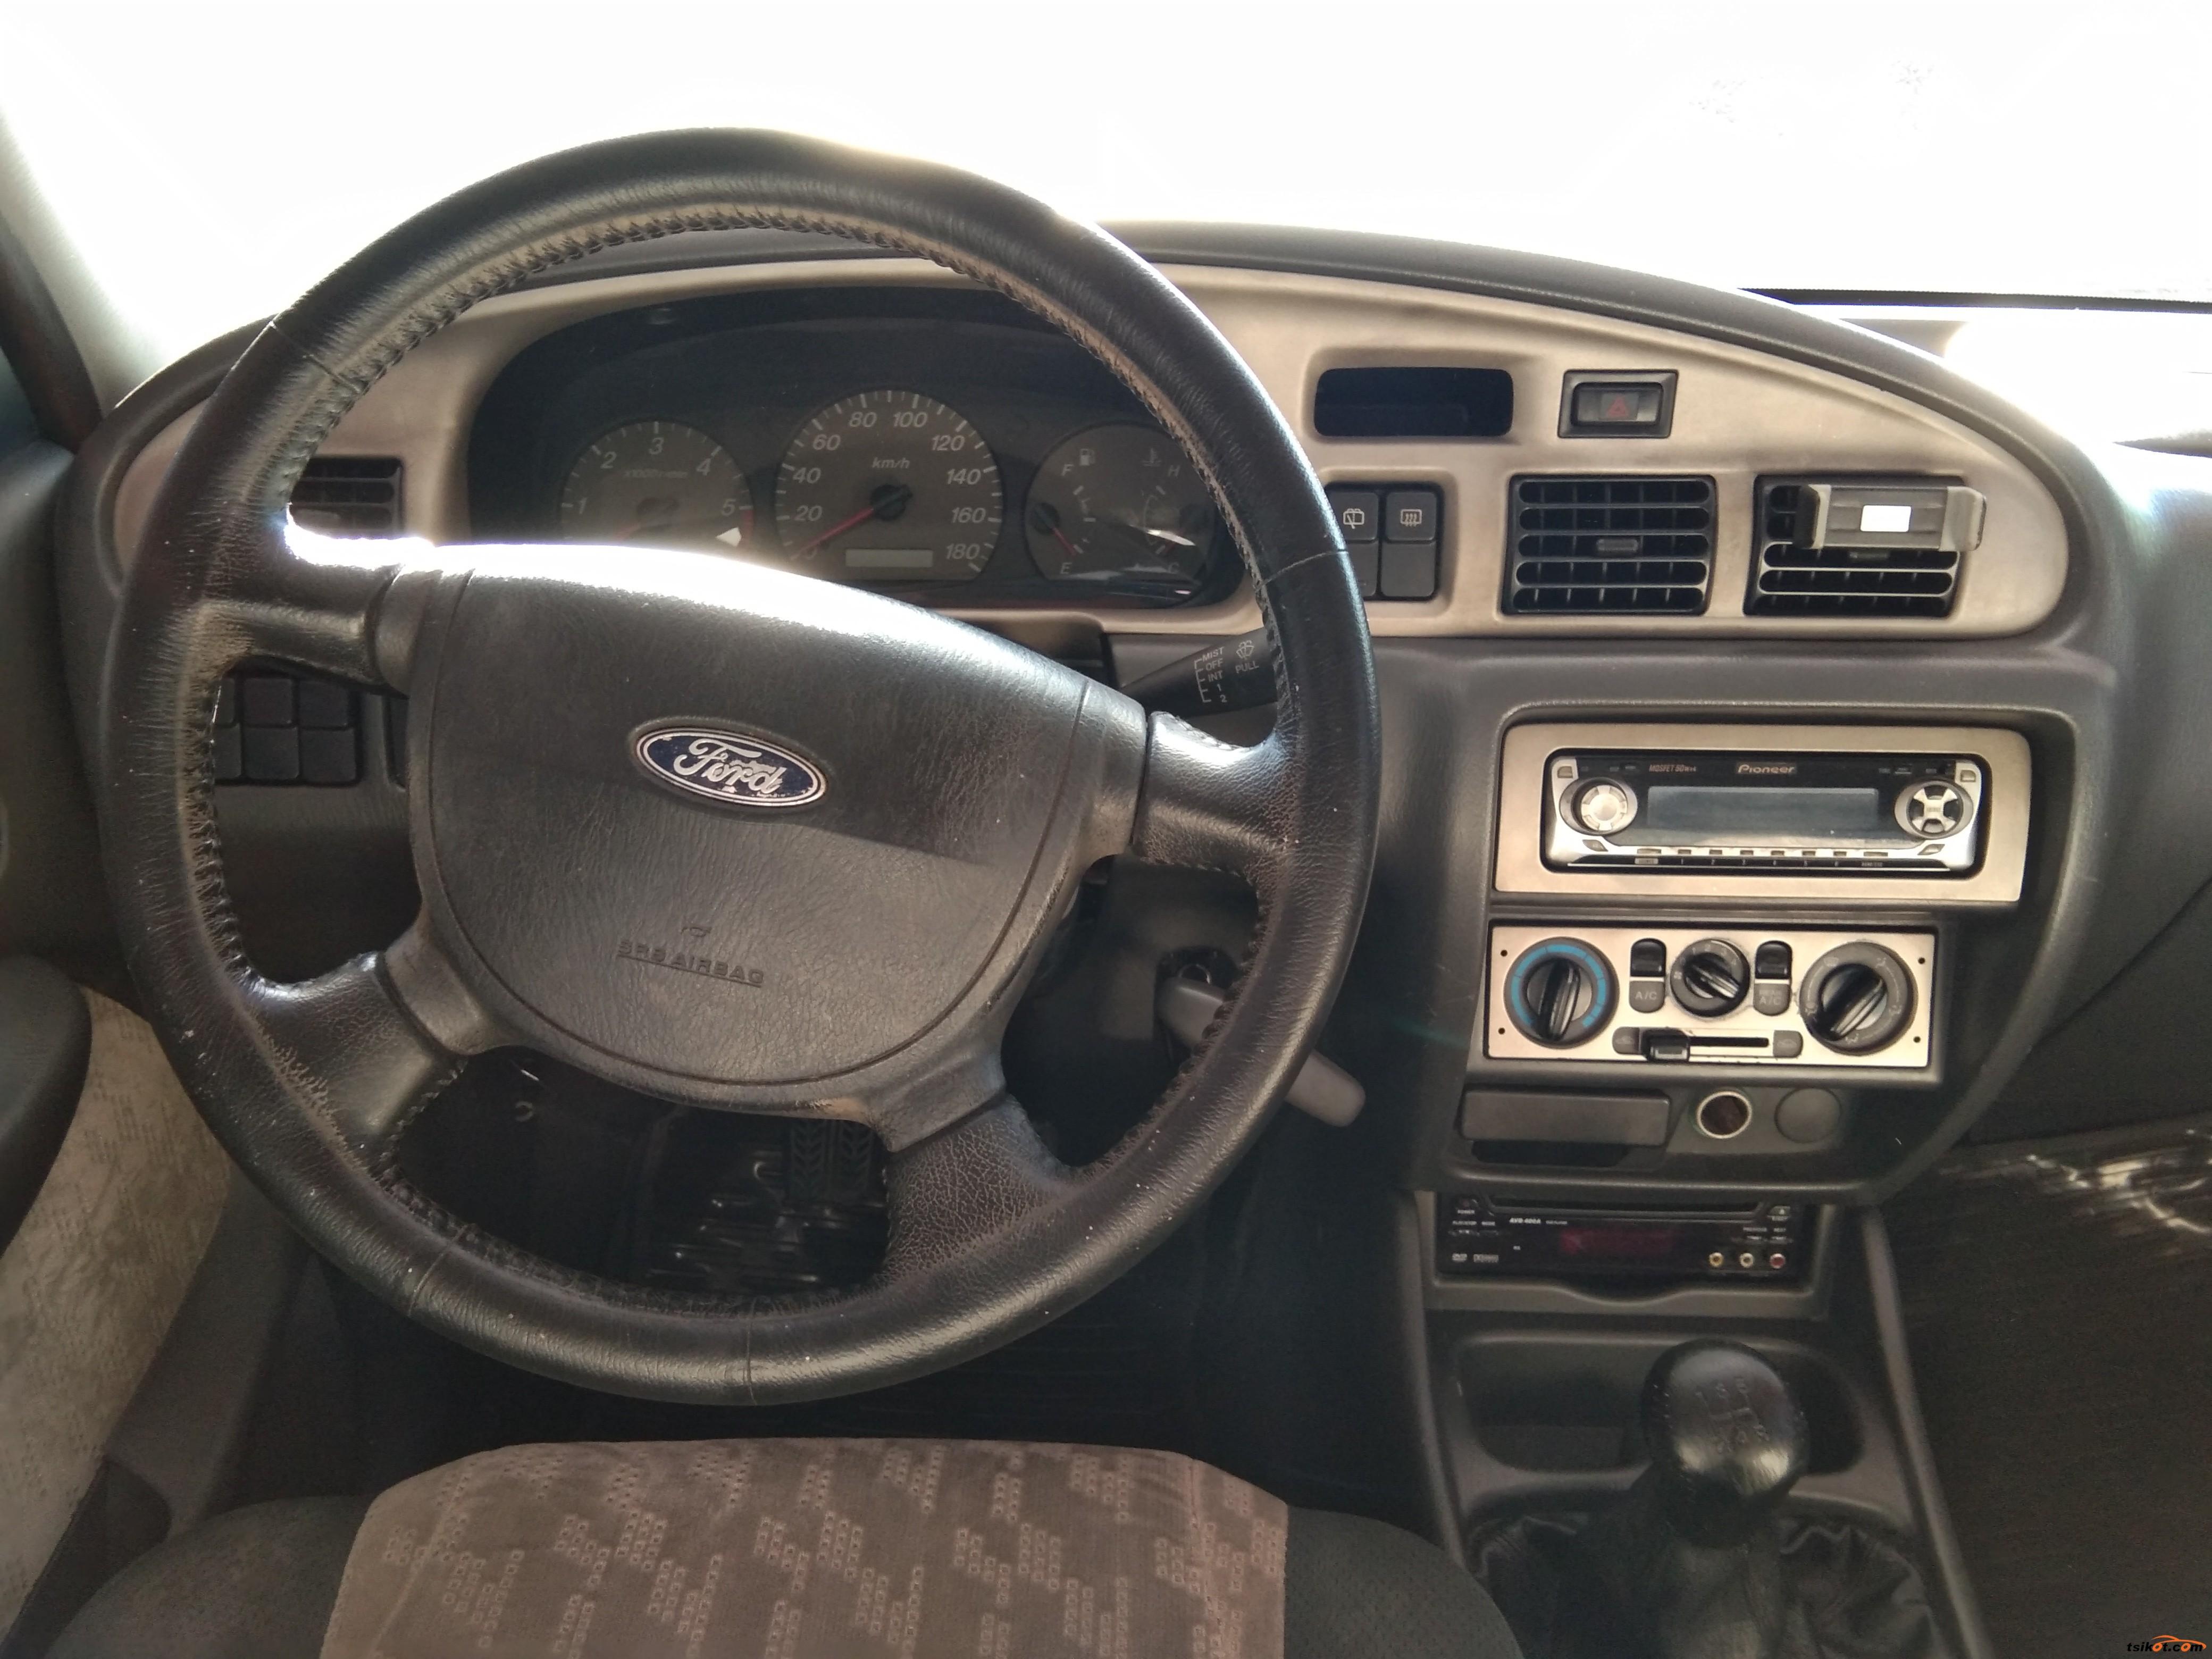 Ford Everest 2005 - 6